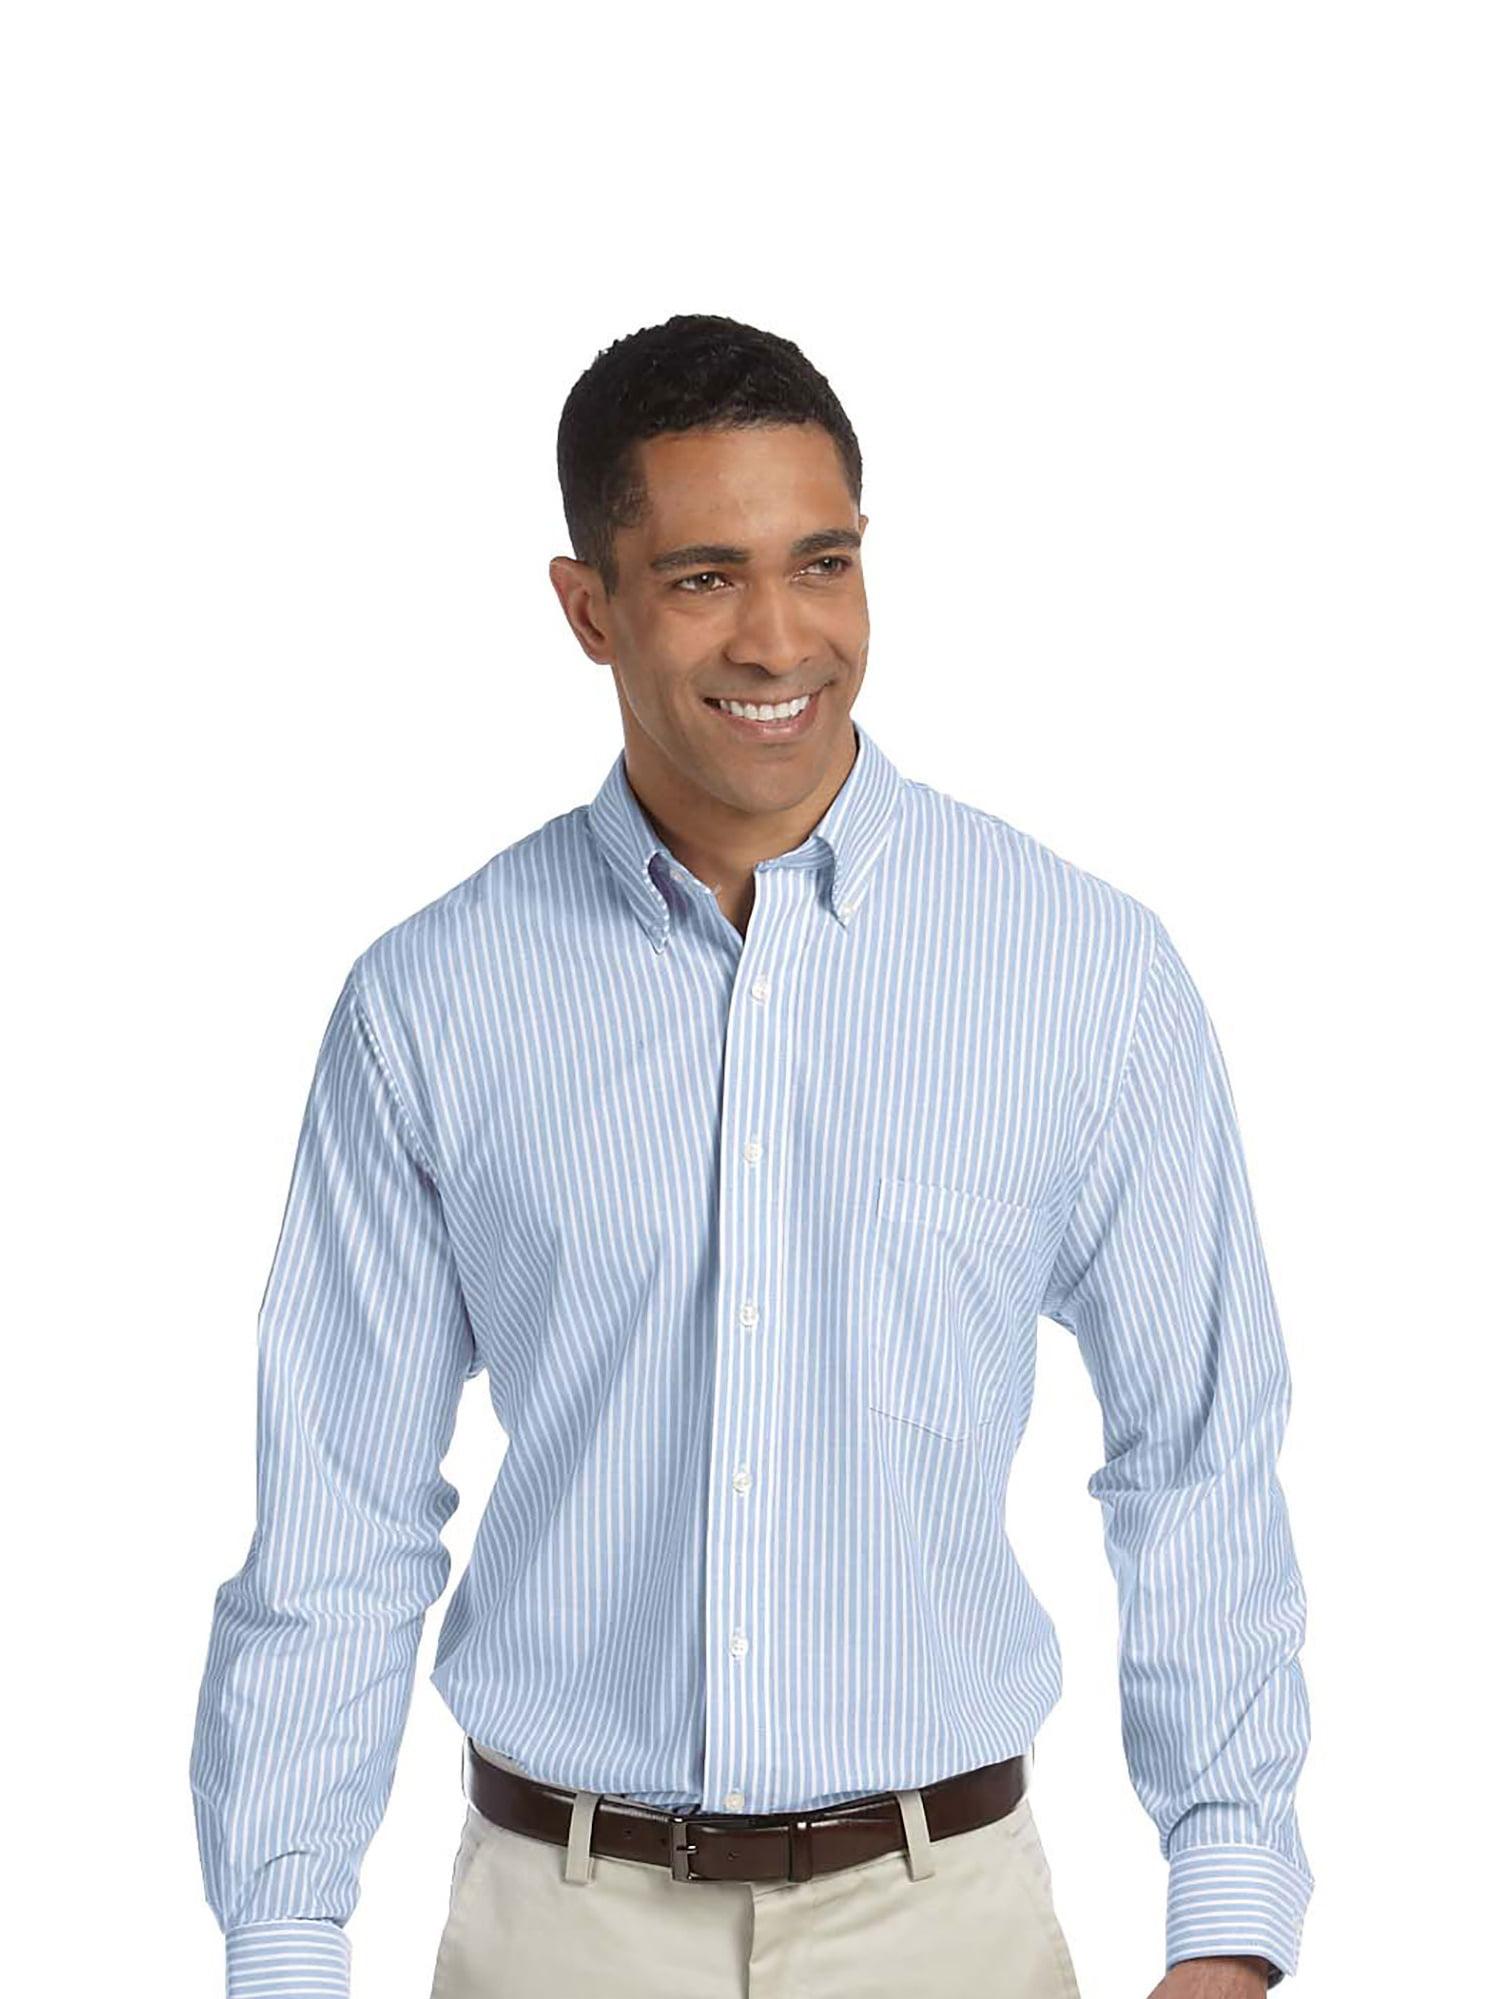 Shirt boys size 6 new dress white 60/% cotton 40/% polyester Van Heusen pocket